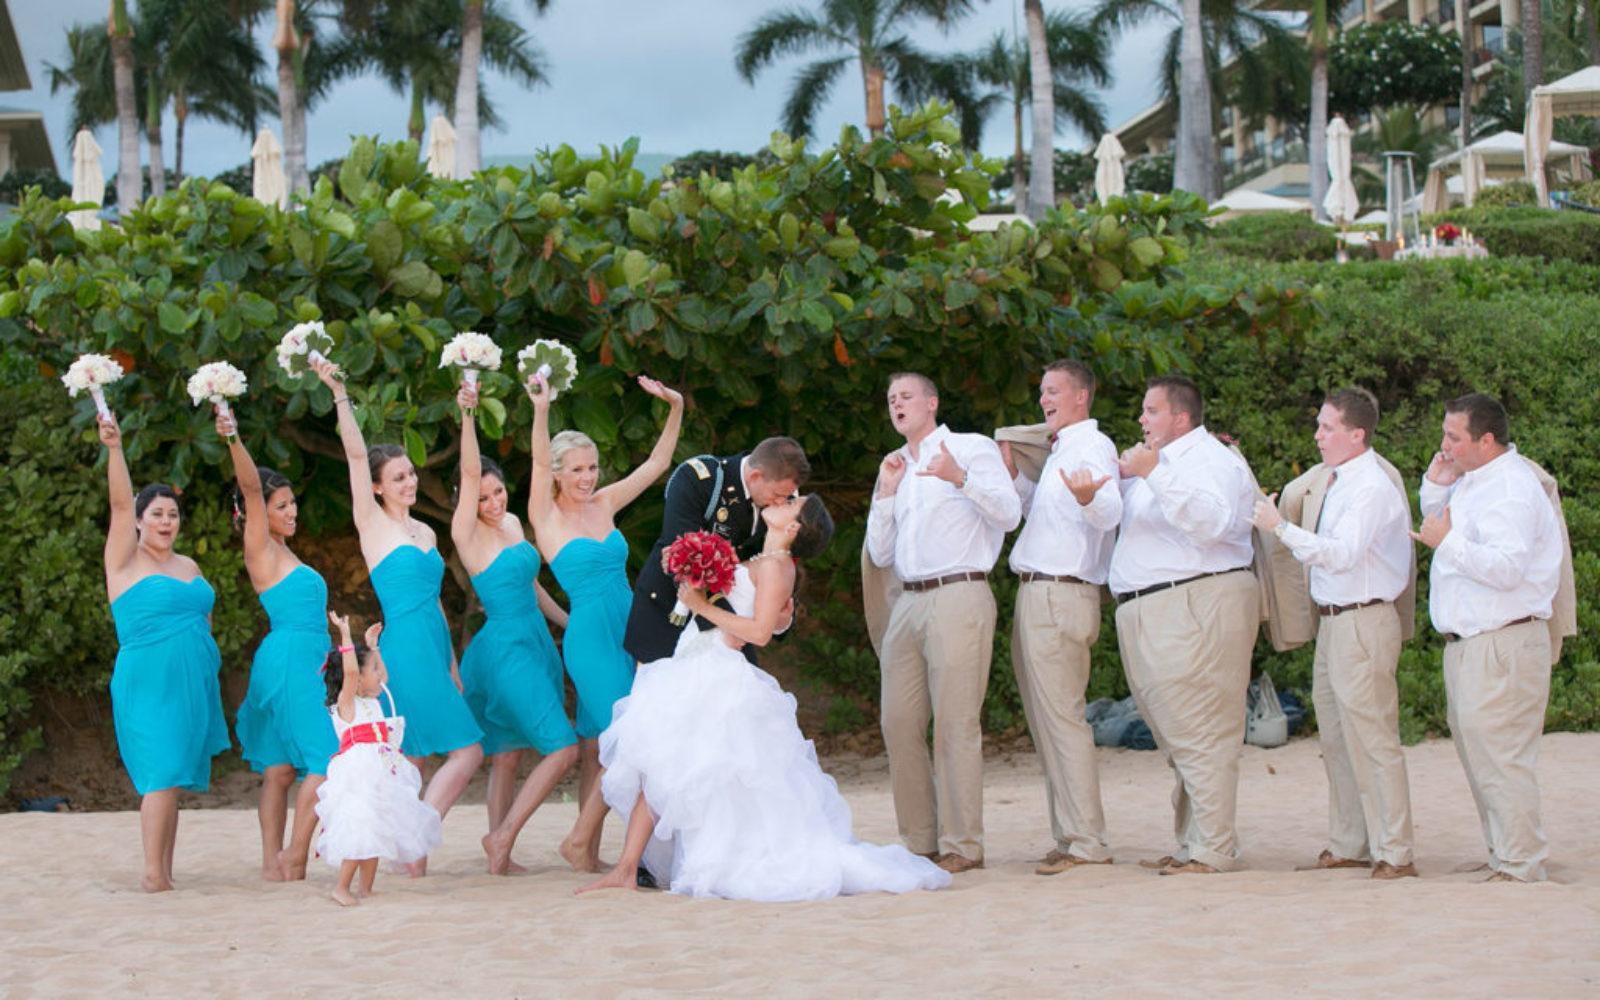 weddingphotographycoloradosprings_03-1024x640